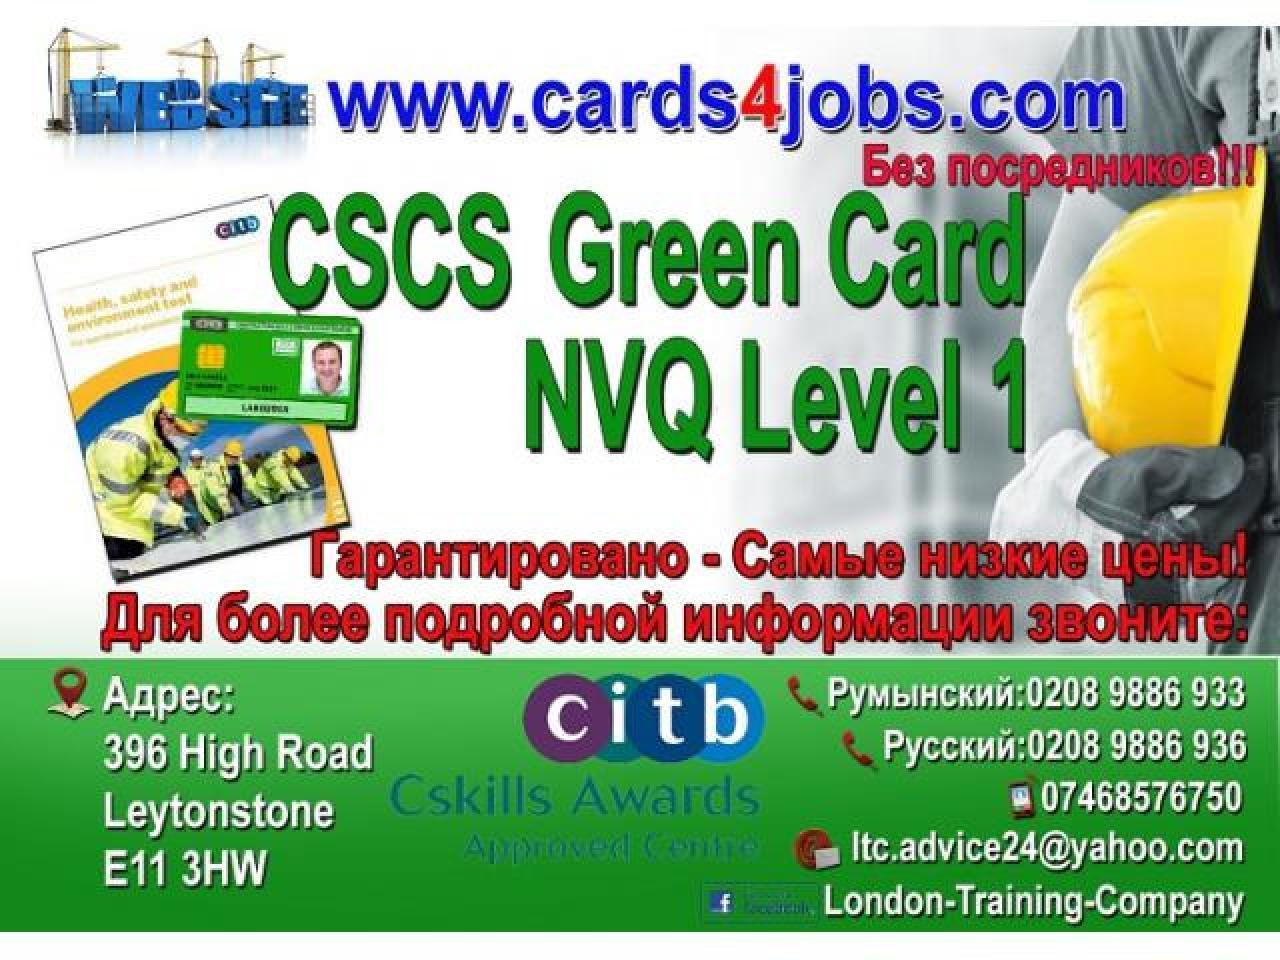 Курс/CSCS зелёная карта / LEVEL 1 -Health and Safety - 1